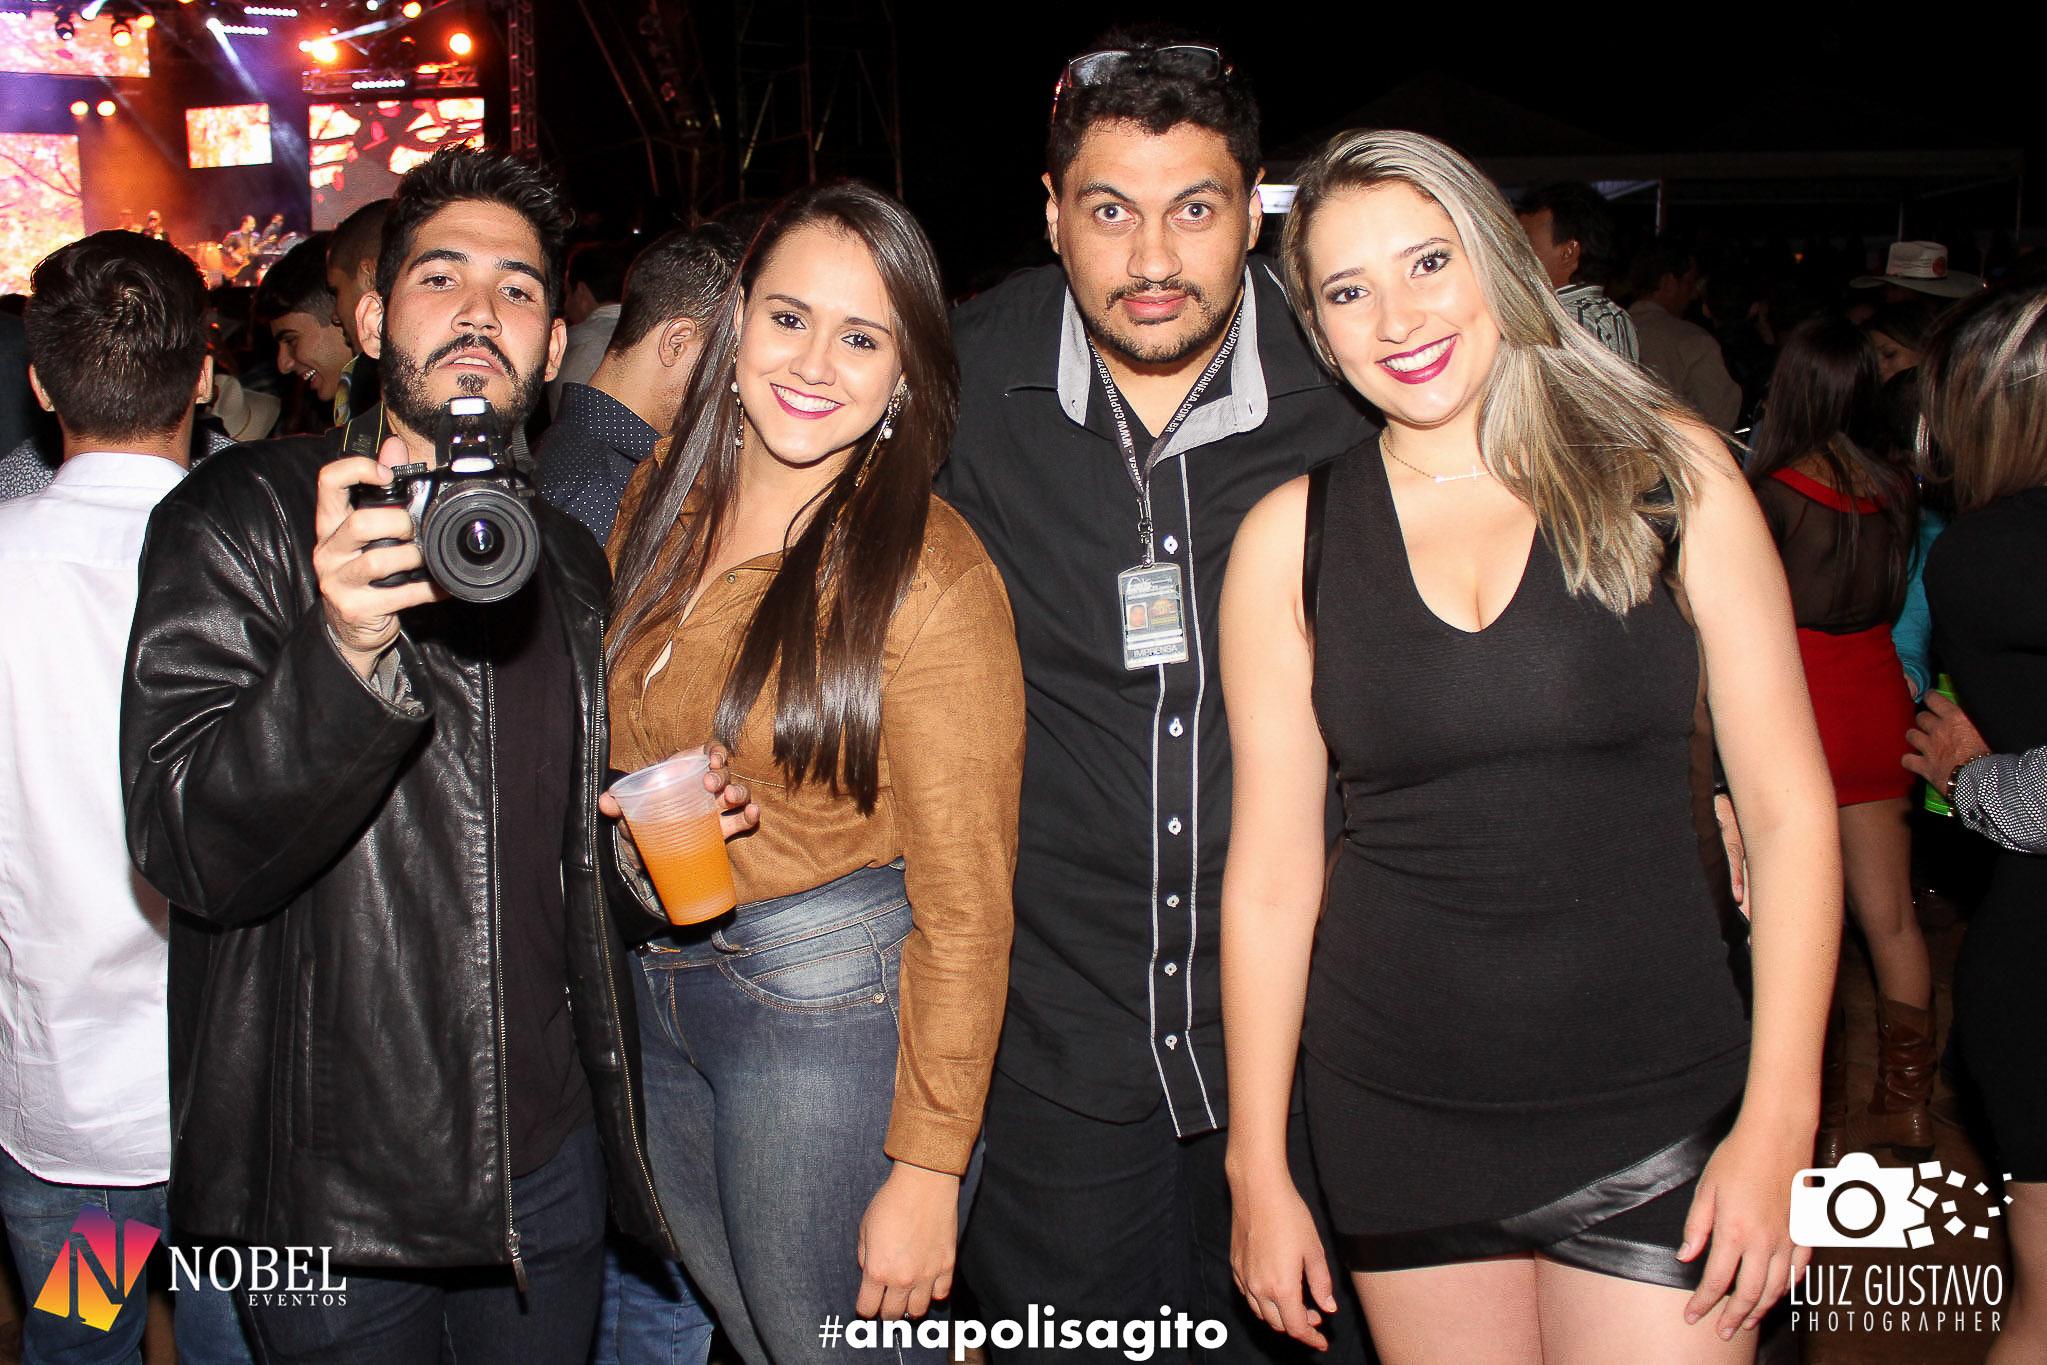 Luiz Gustavo Photographer-9